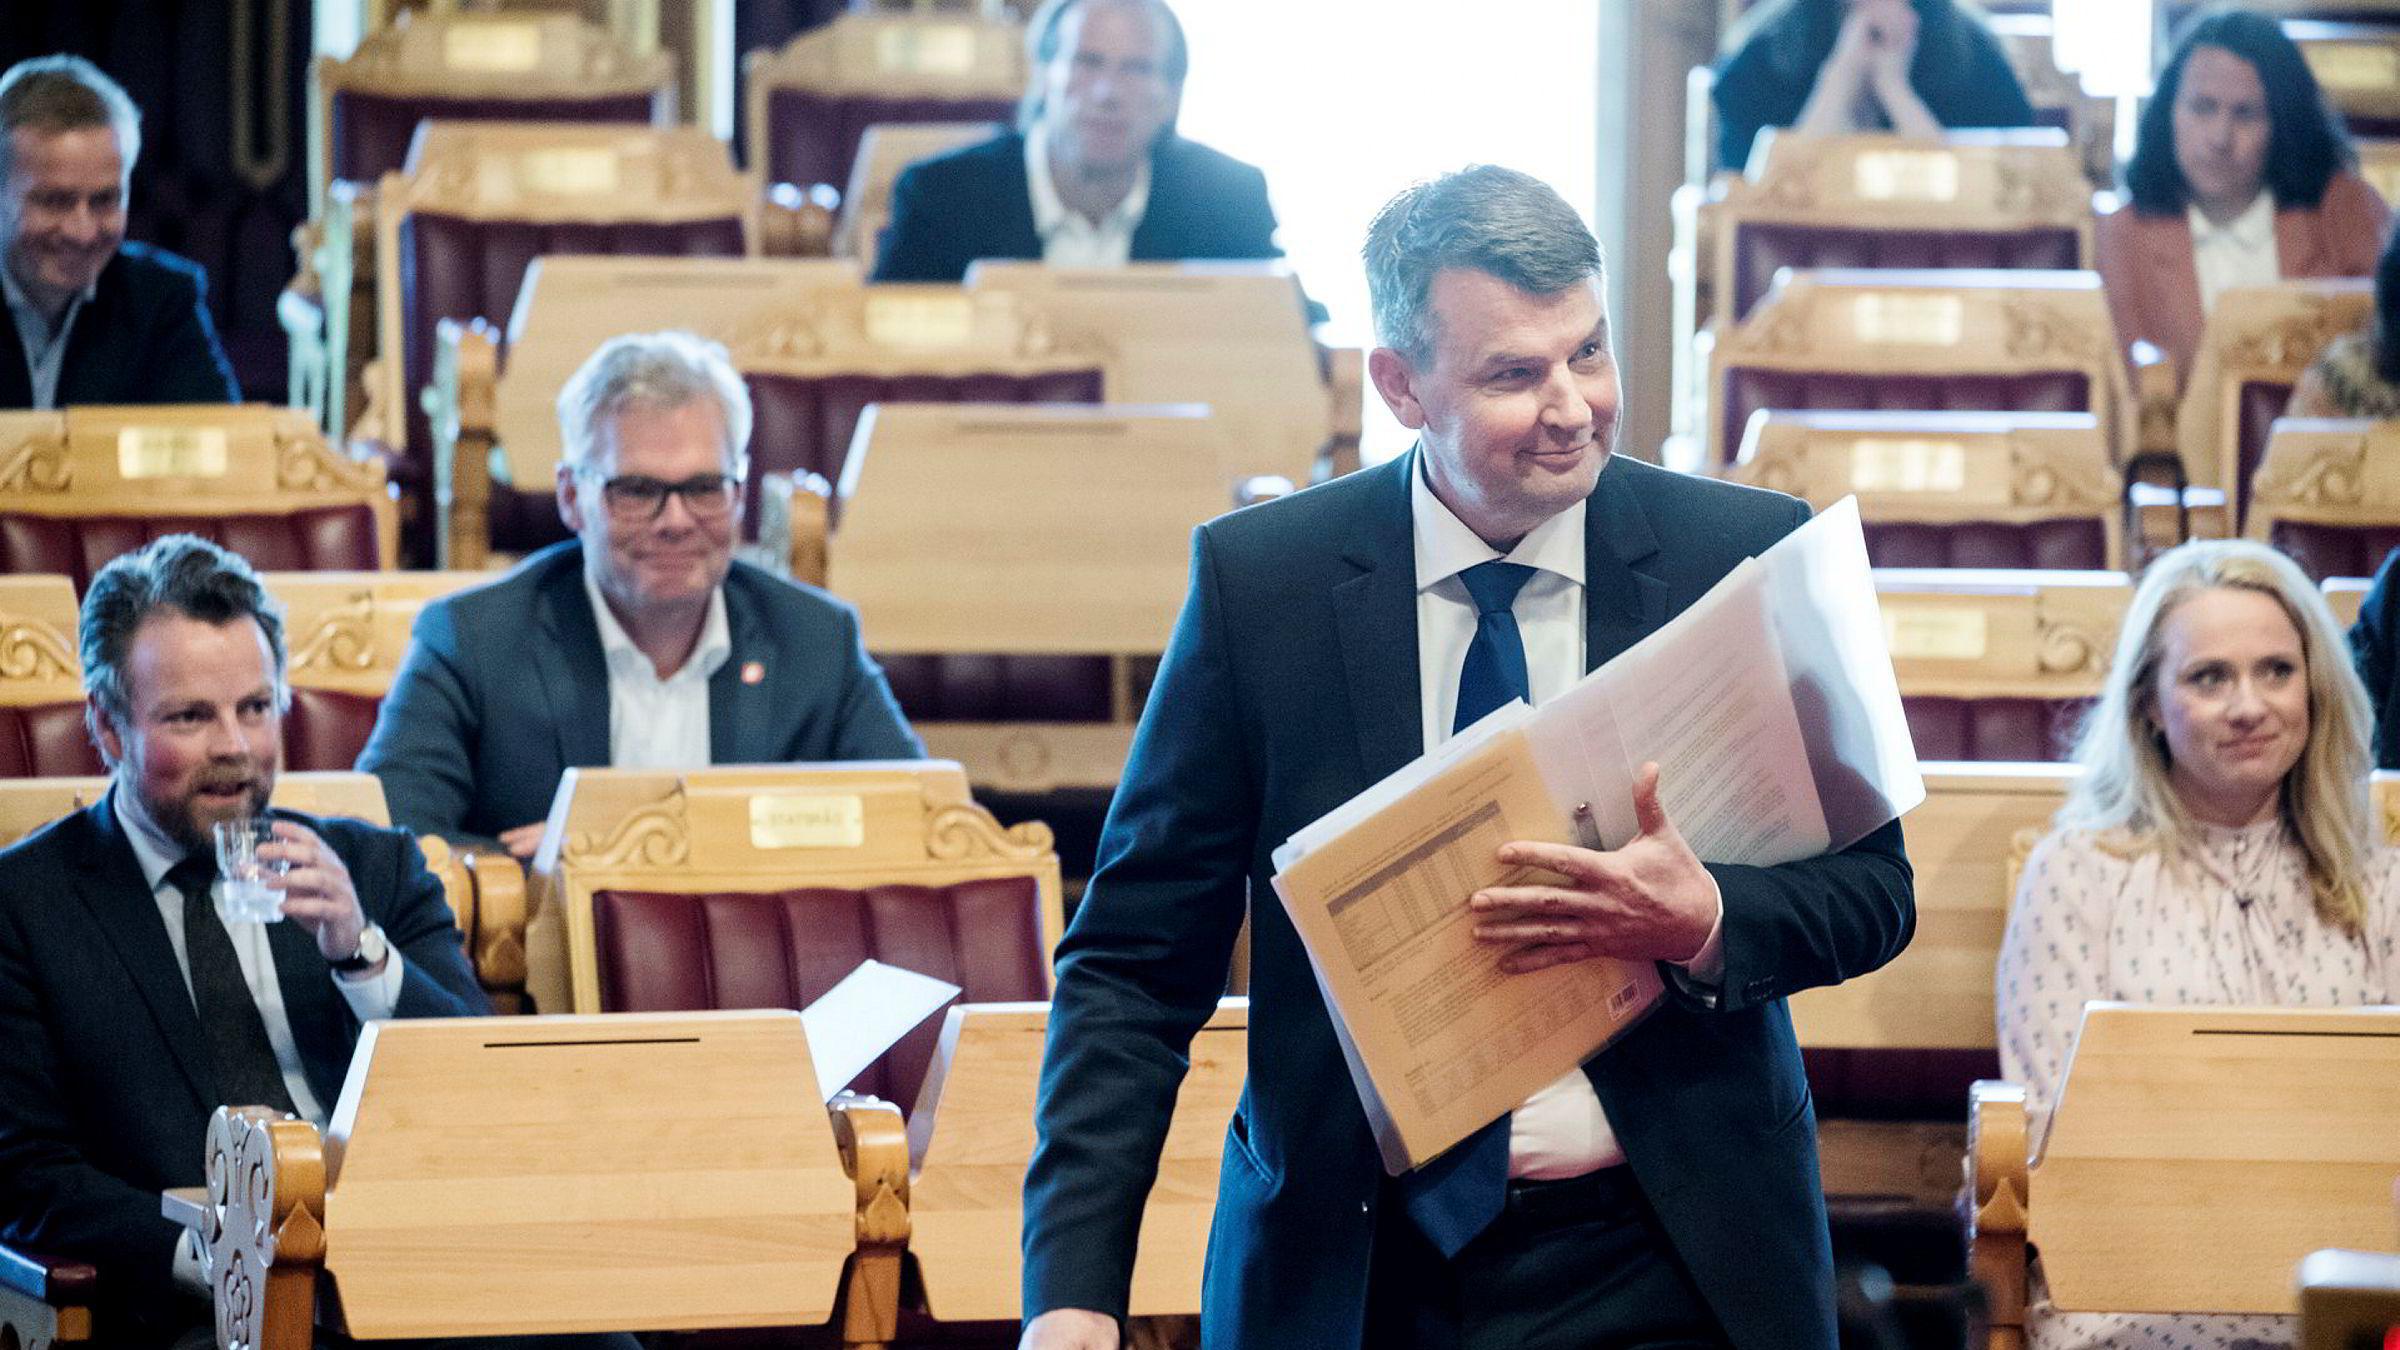 Landets nye justisminister Tor Mikkel Vara (?) balanserer permen sin på vei til talerstolen i hans første spontanspørretime på Stortinget. Til venstre er næringsminister Torbjørn Røe Isaksen. Til høyre sitter arbeidsminister Anniken Hauglie.